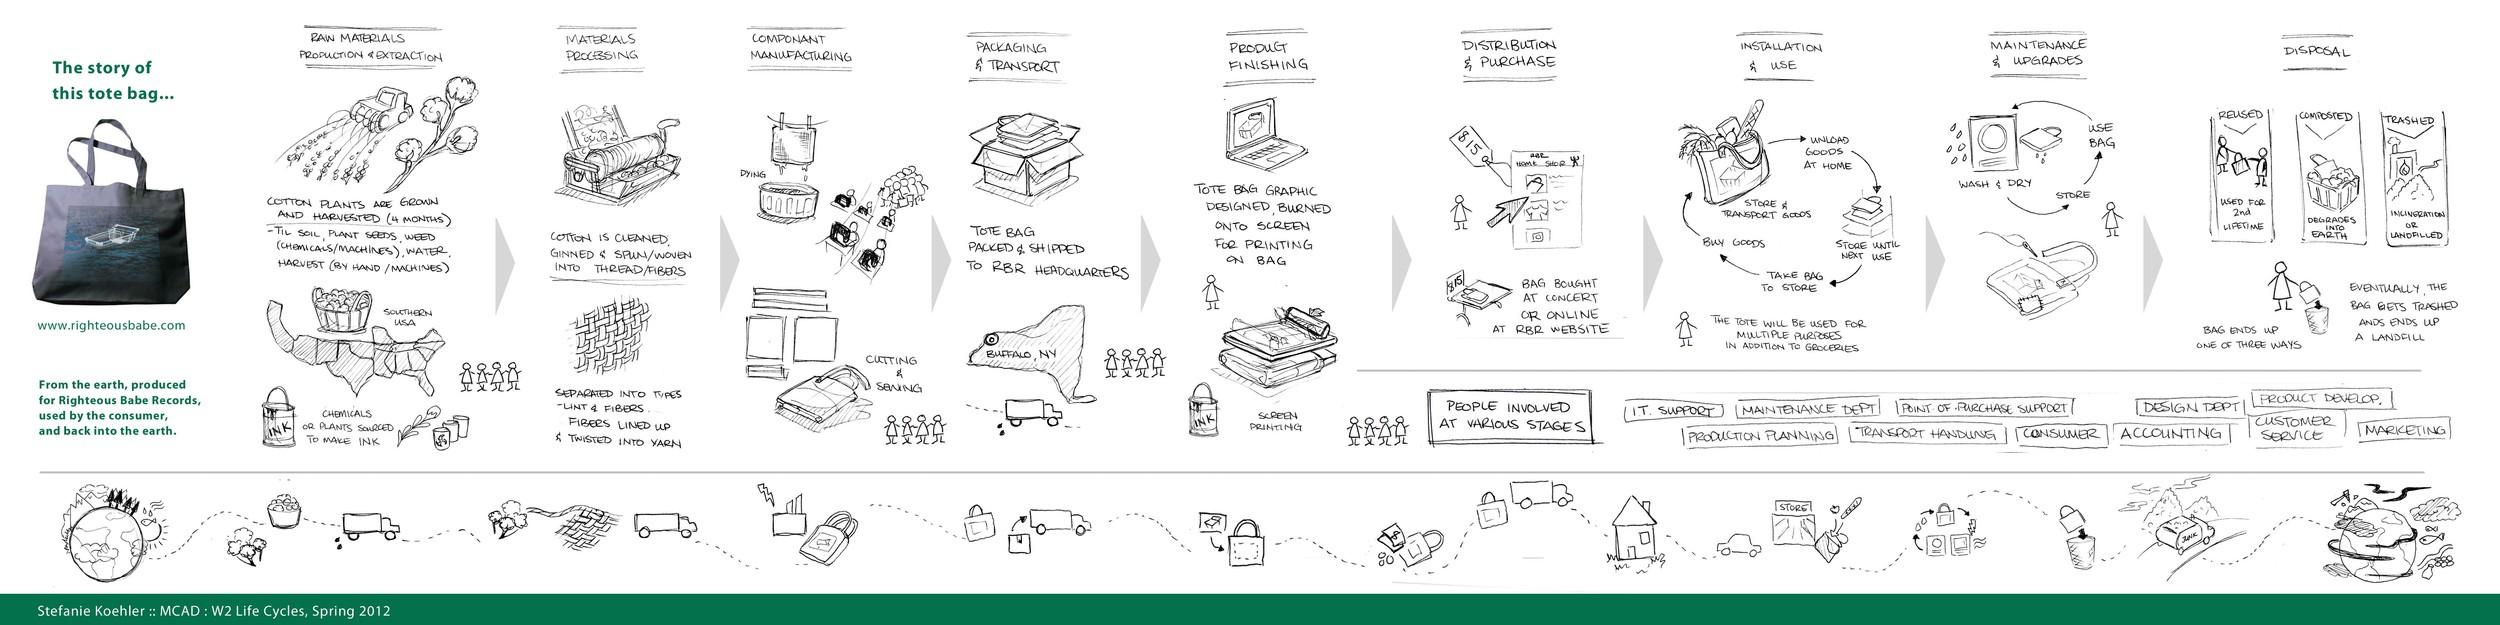 Visual Storytelling, Cotton Tote Bag Life-Cycle